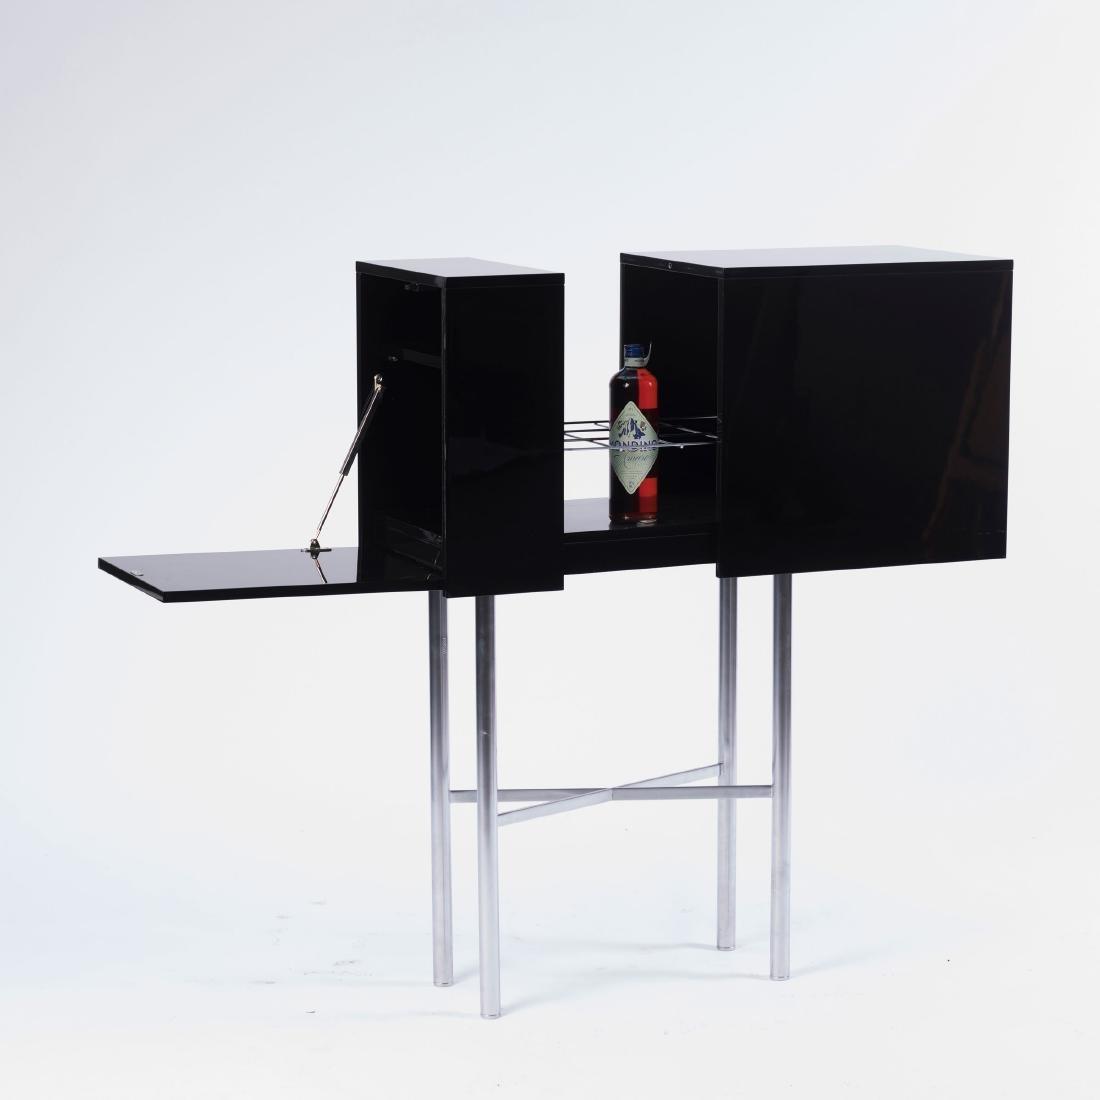 'Pandora' liquor cabinet 1994 - 2